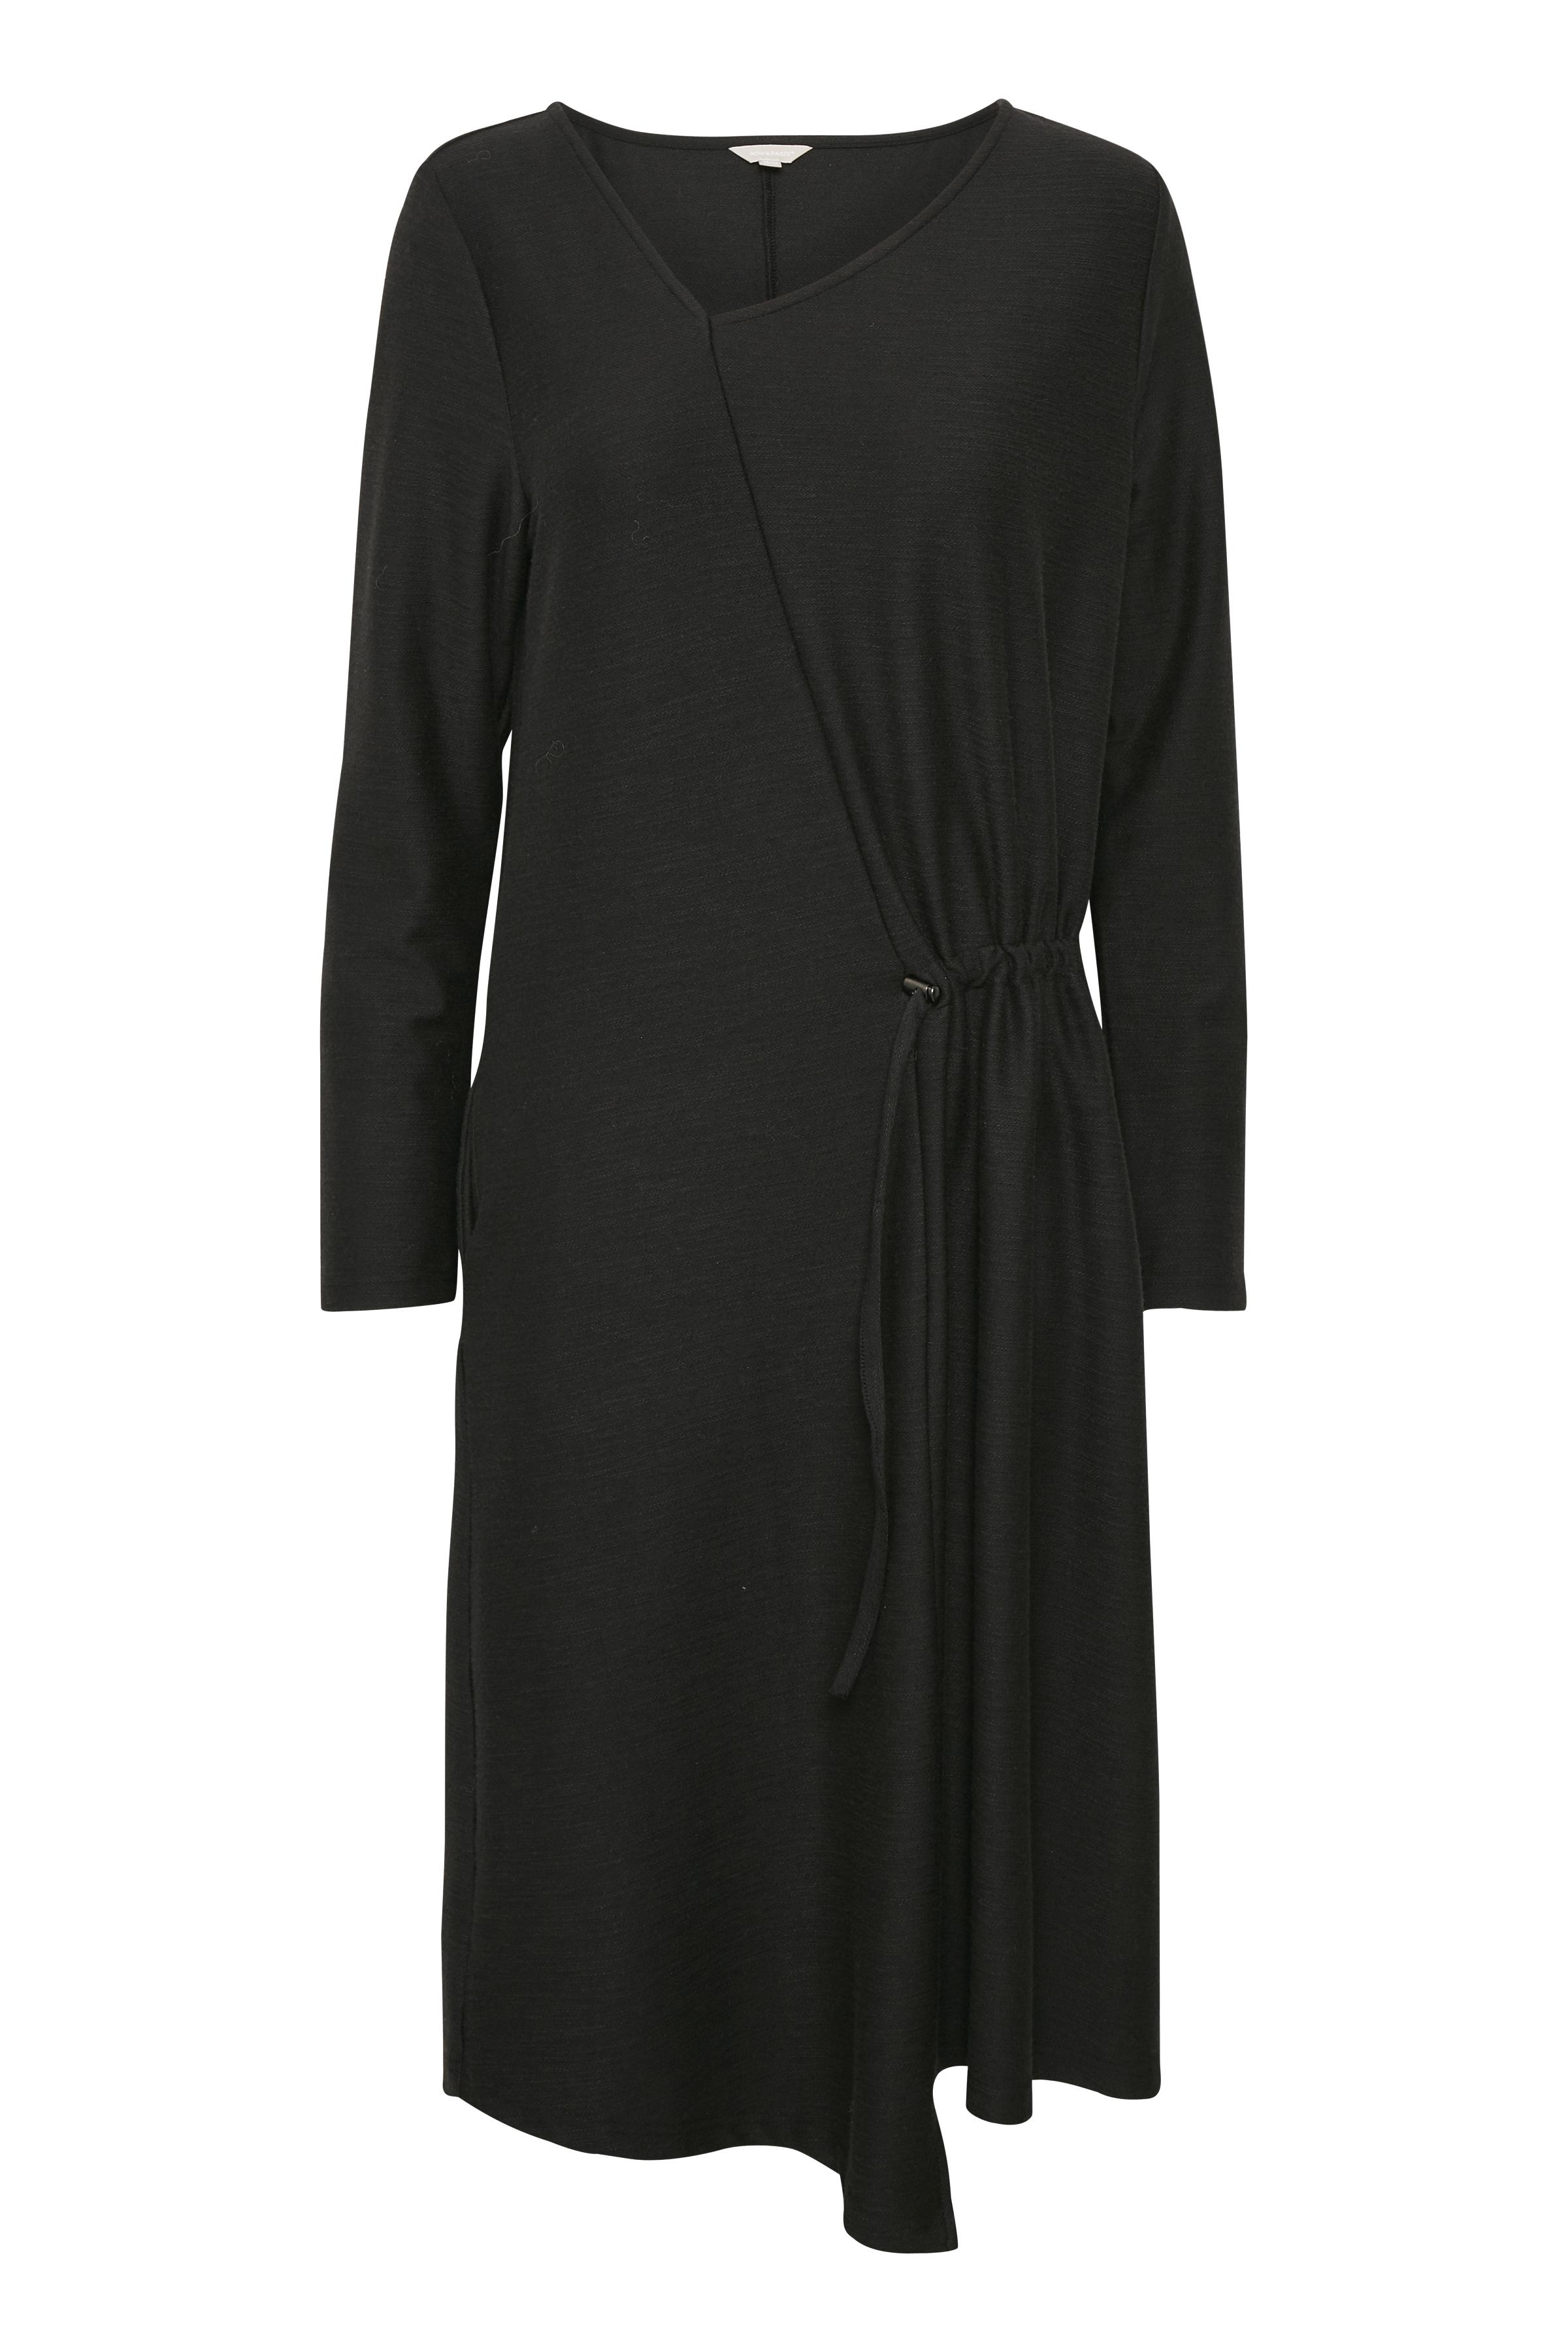 Image of BonA Parte Dame Ida-marie kjole - Sort